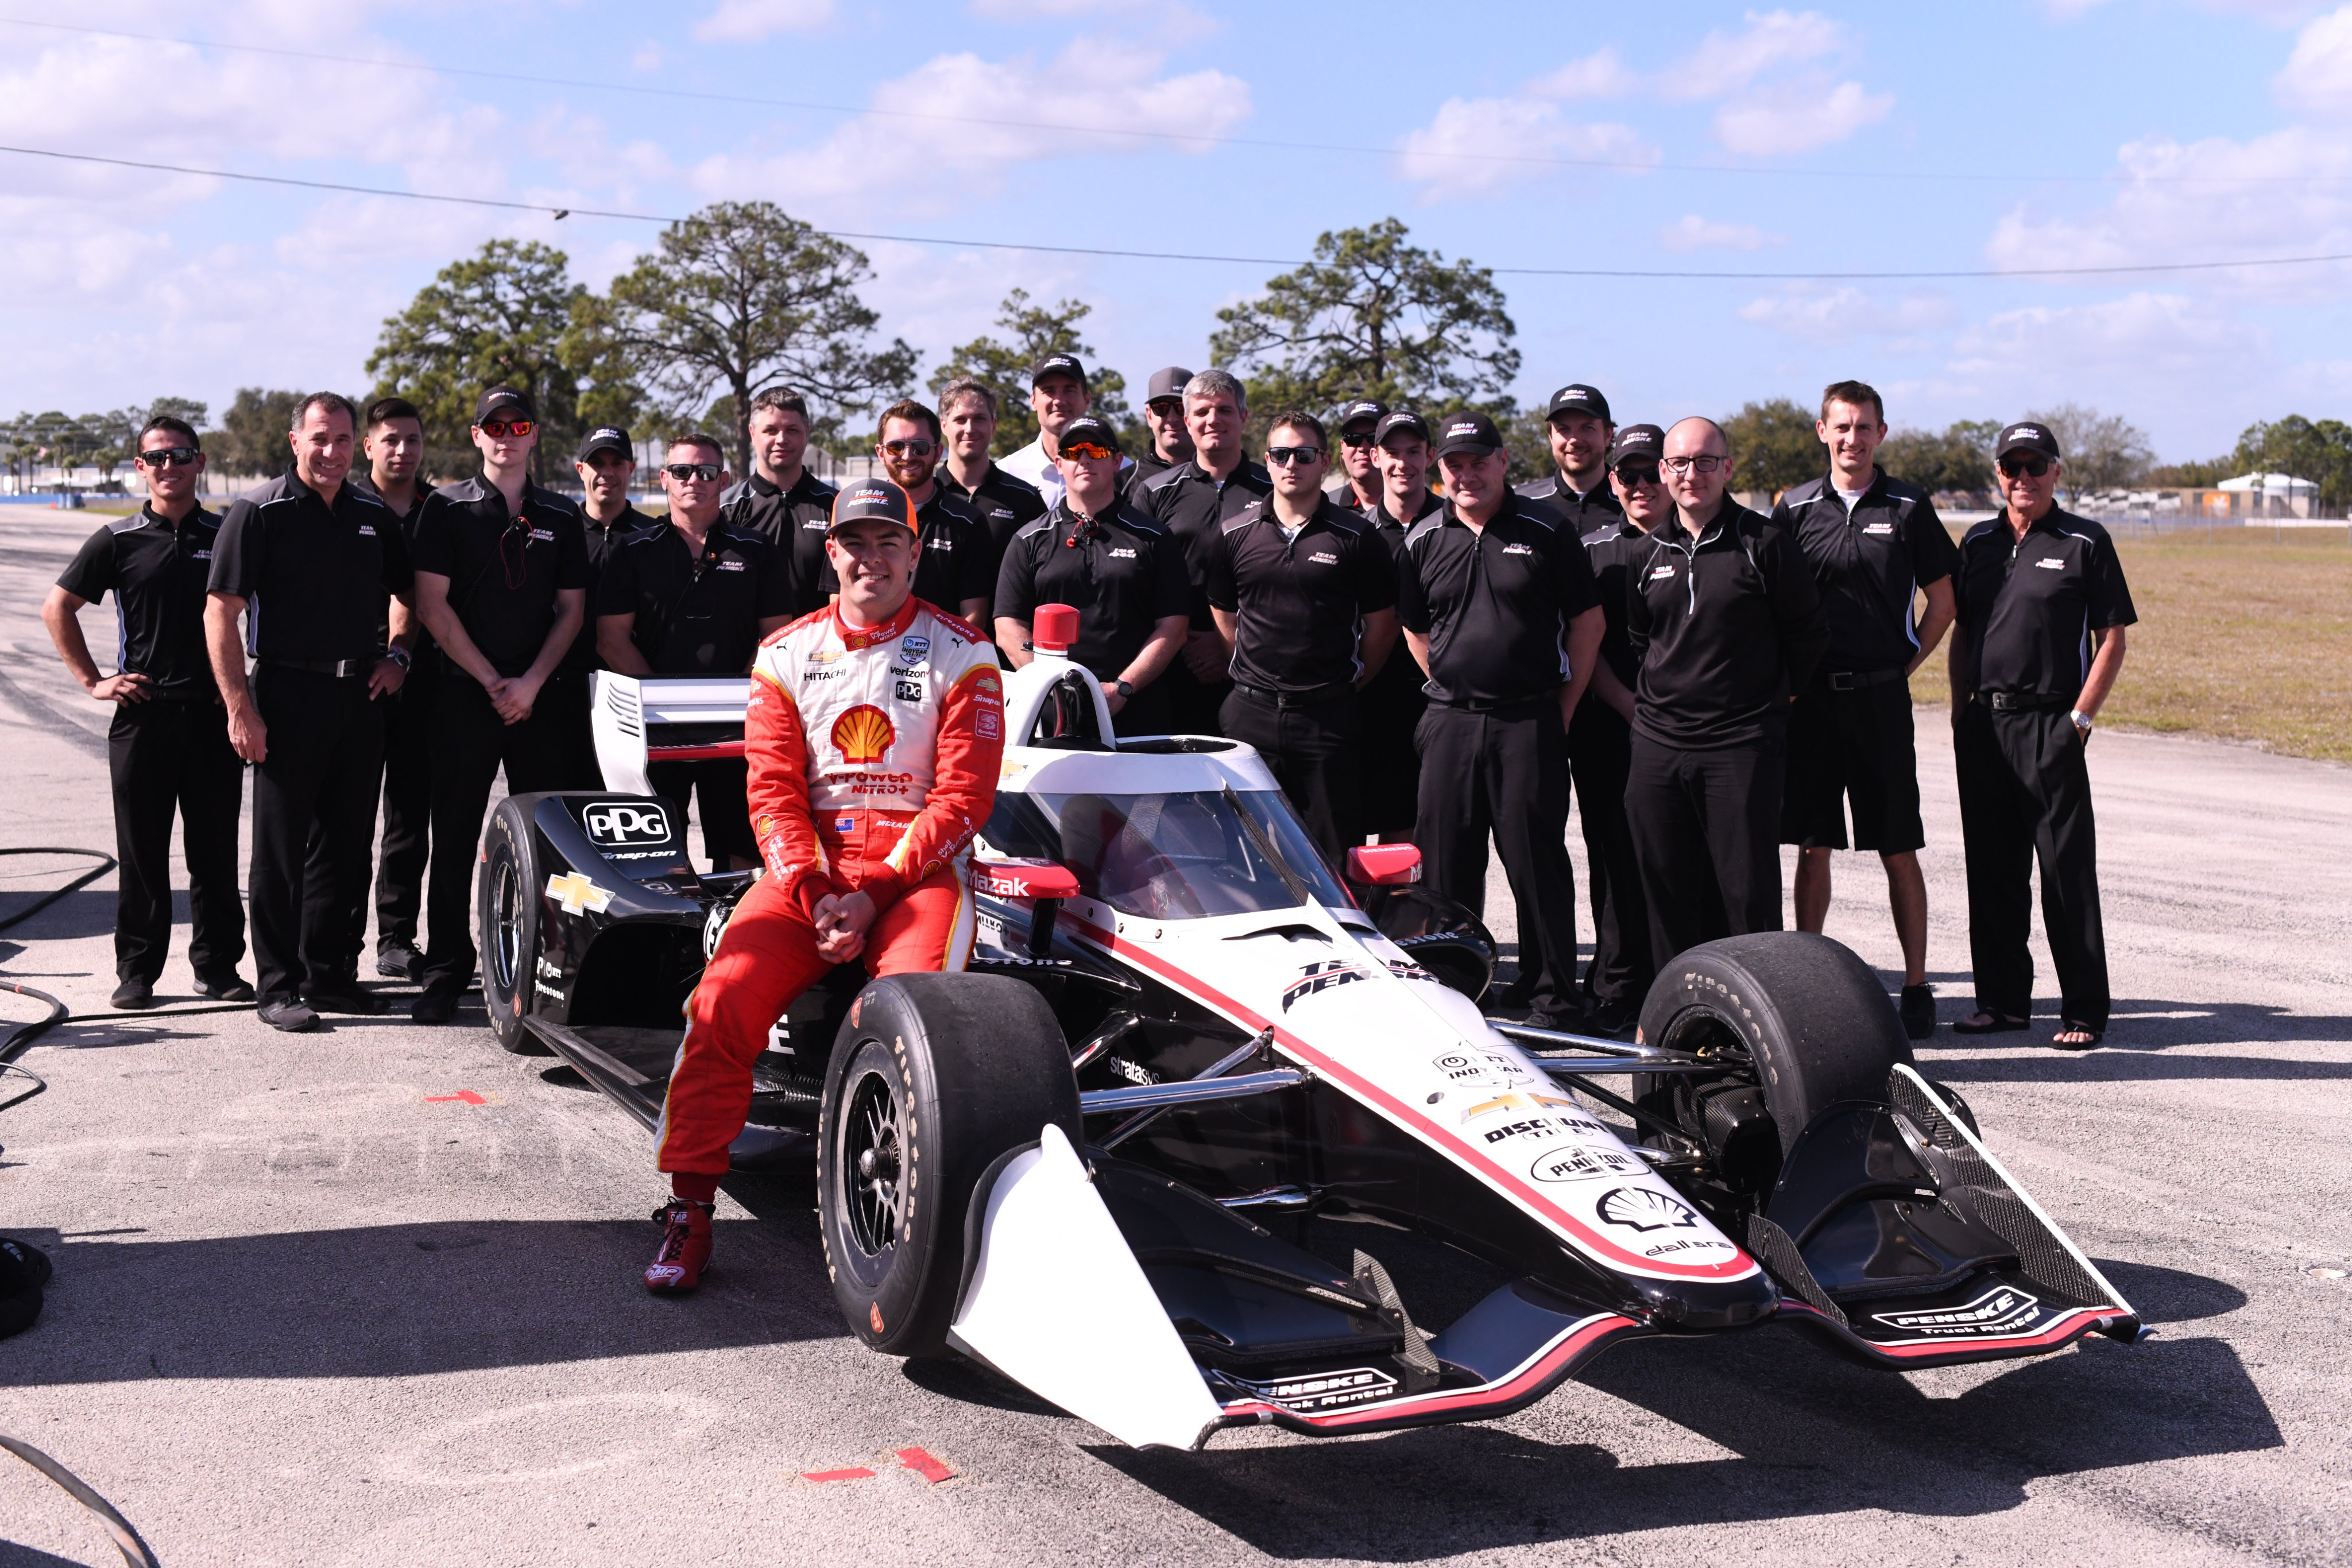 IndyCar Penske Scott McLaughlin